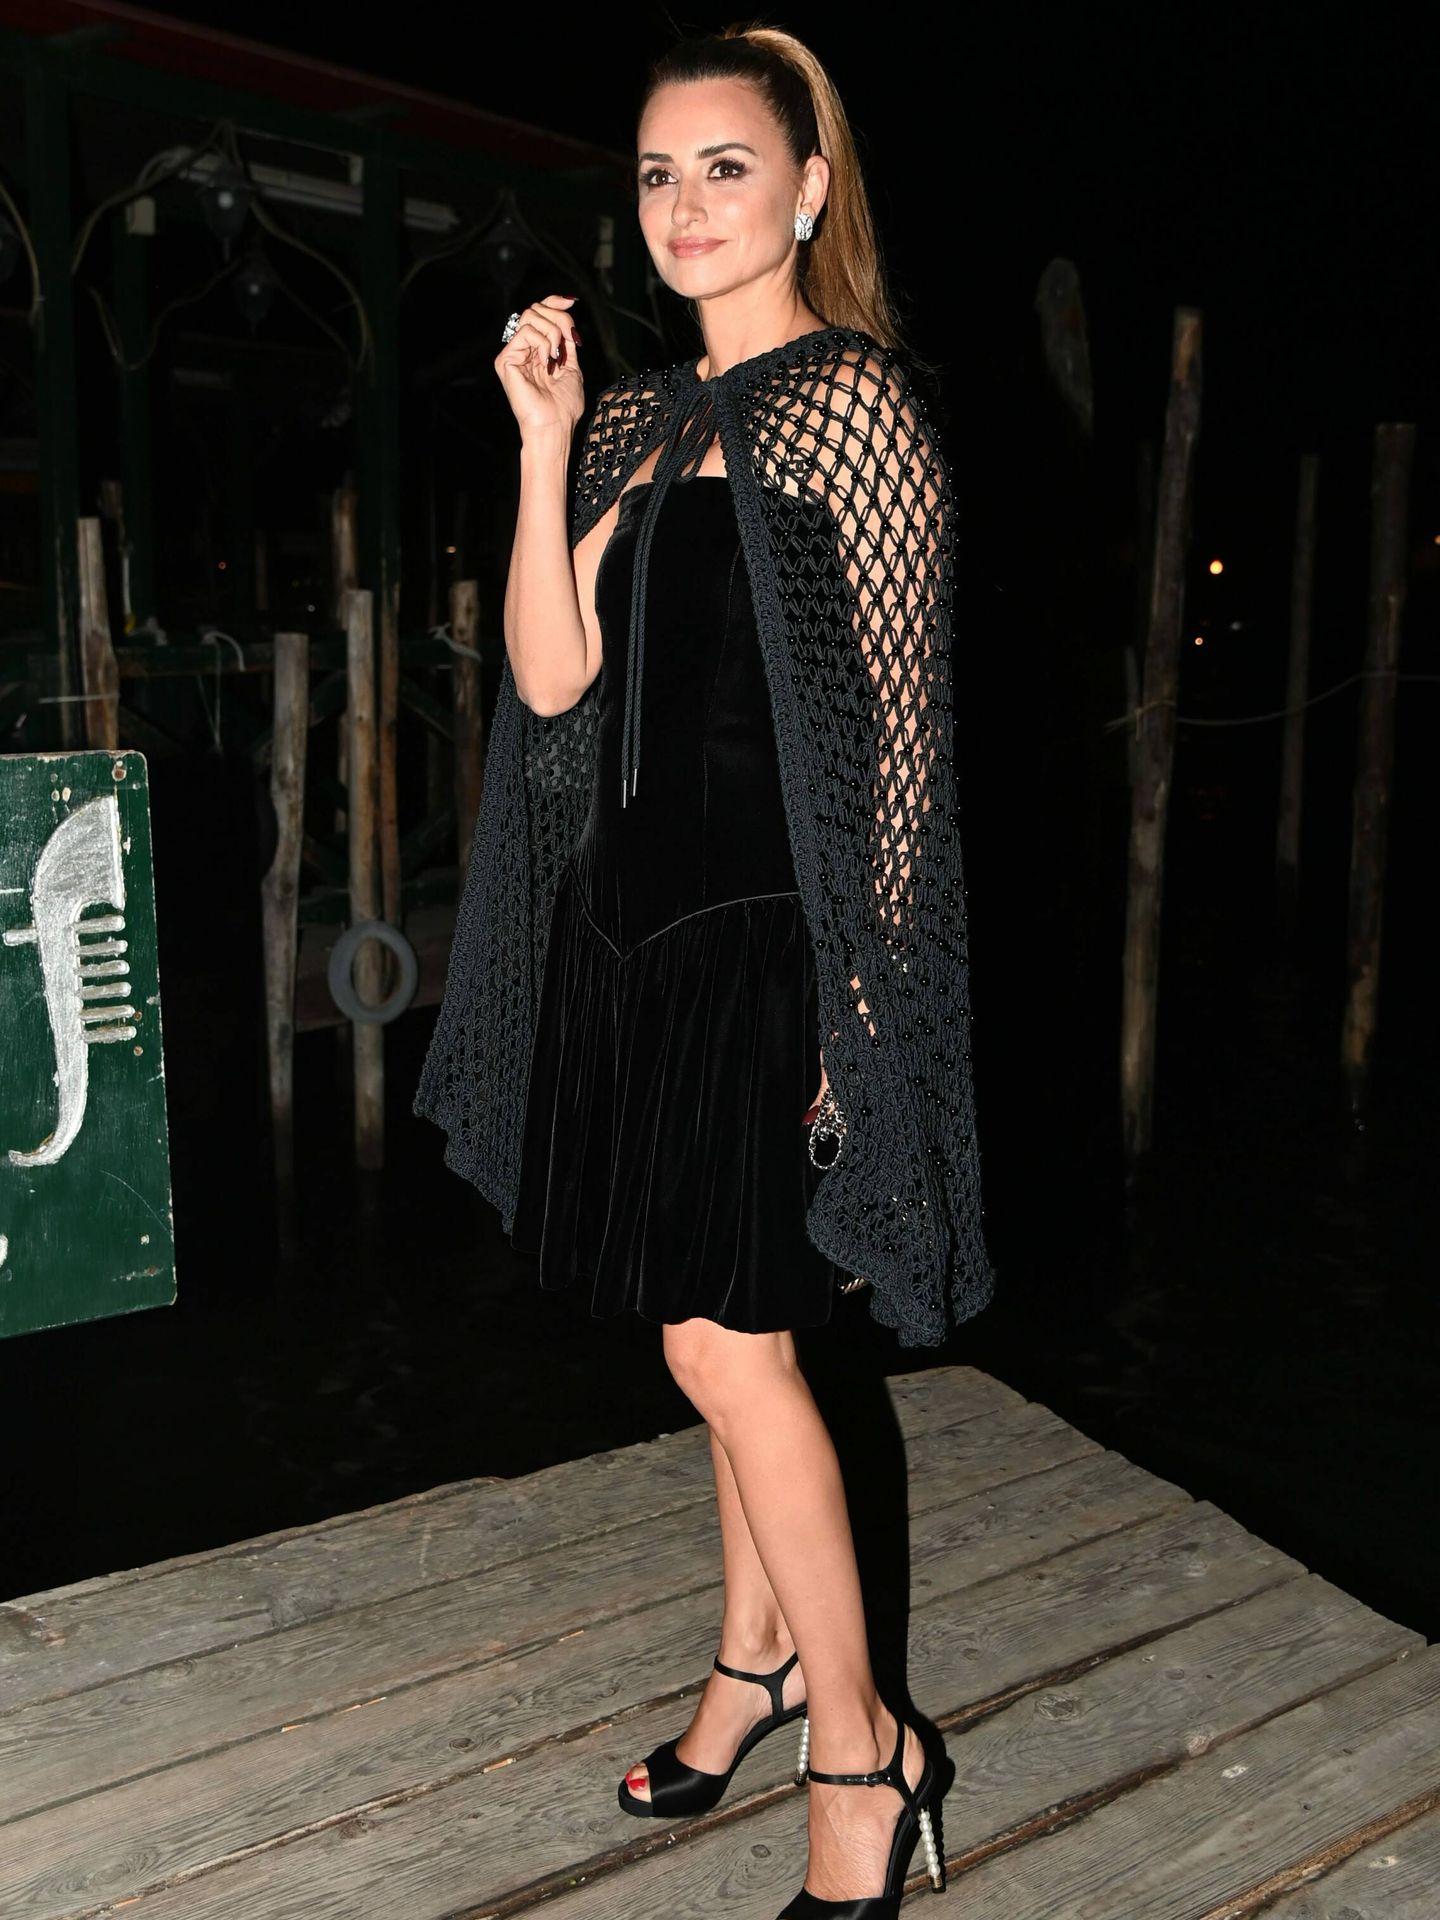 Penélope Cruz, en Venecia en la fiesta de Yves Saint Laurent. (Cordon Press)